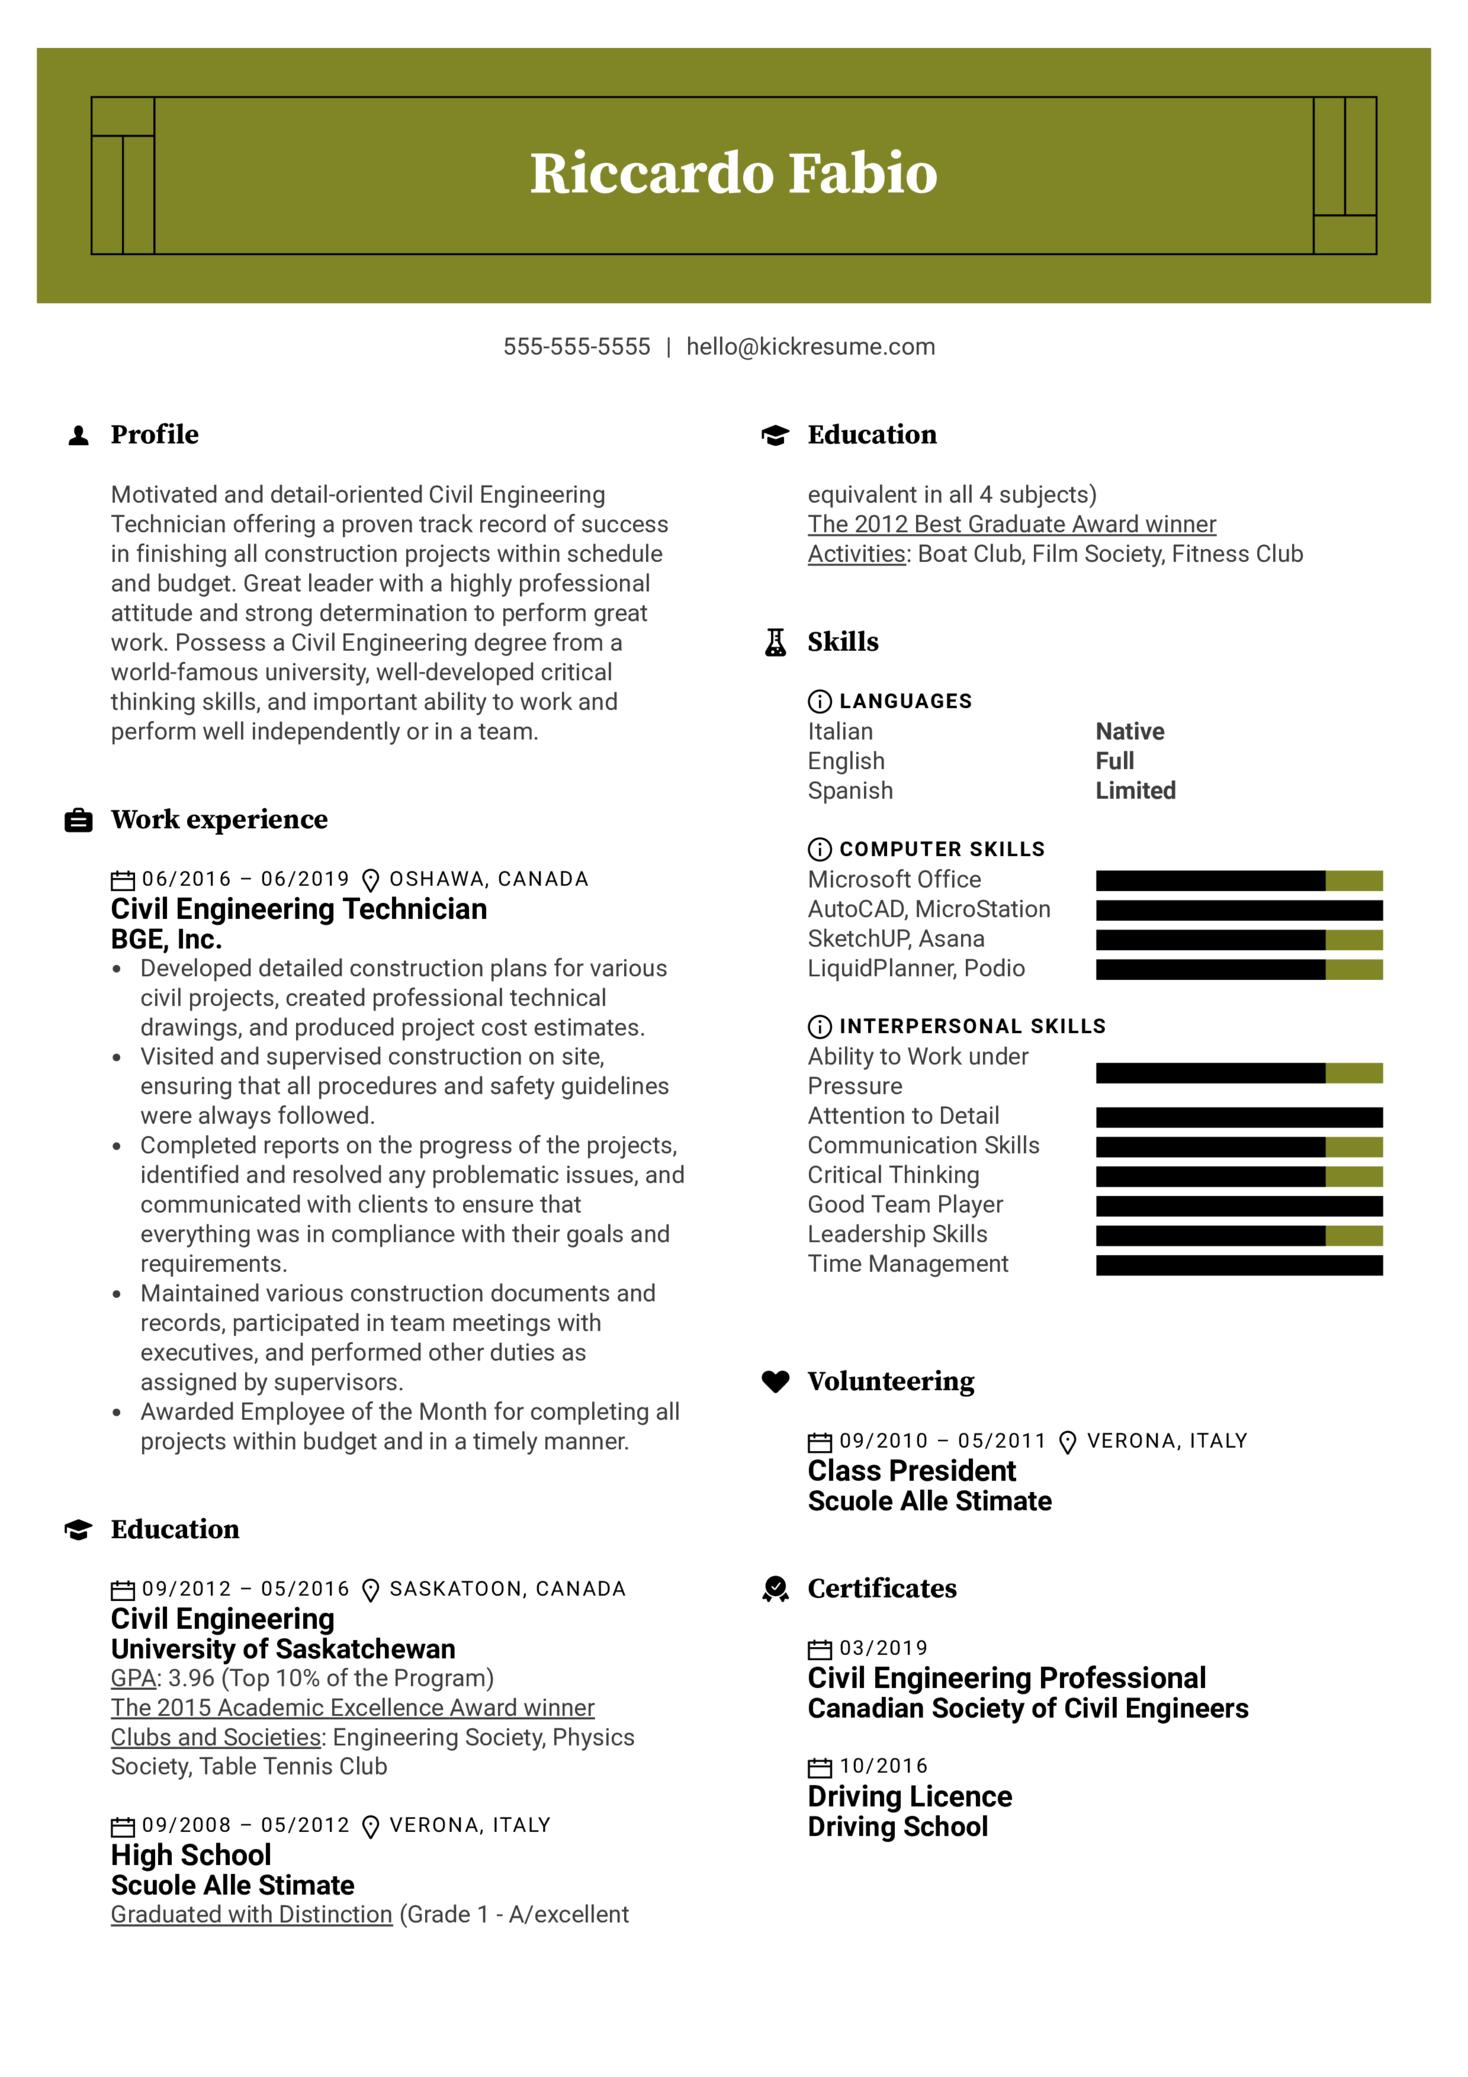 Civil Engineering Technician Resume Sample (Part 1)